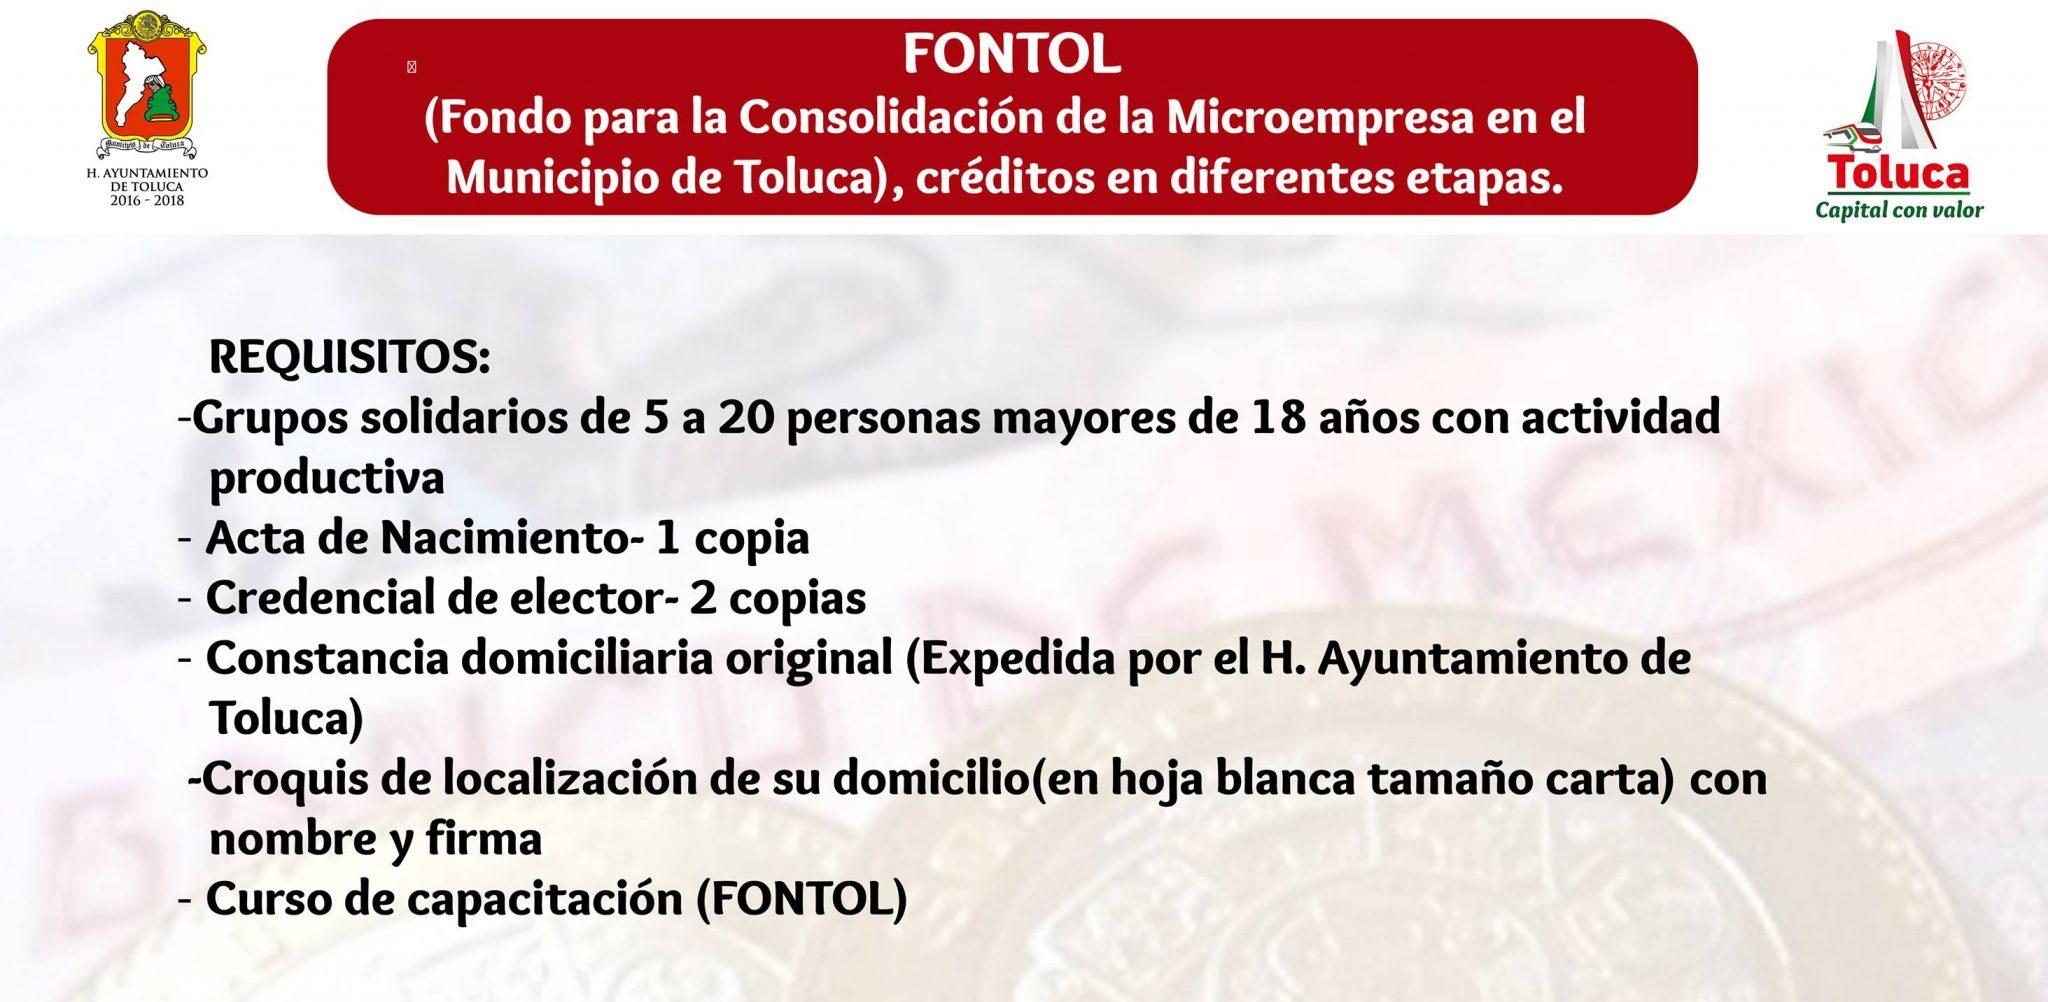 FONTOL.jpg